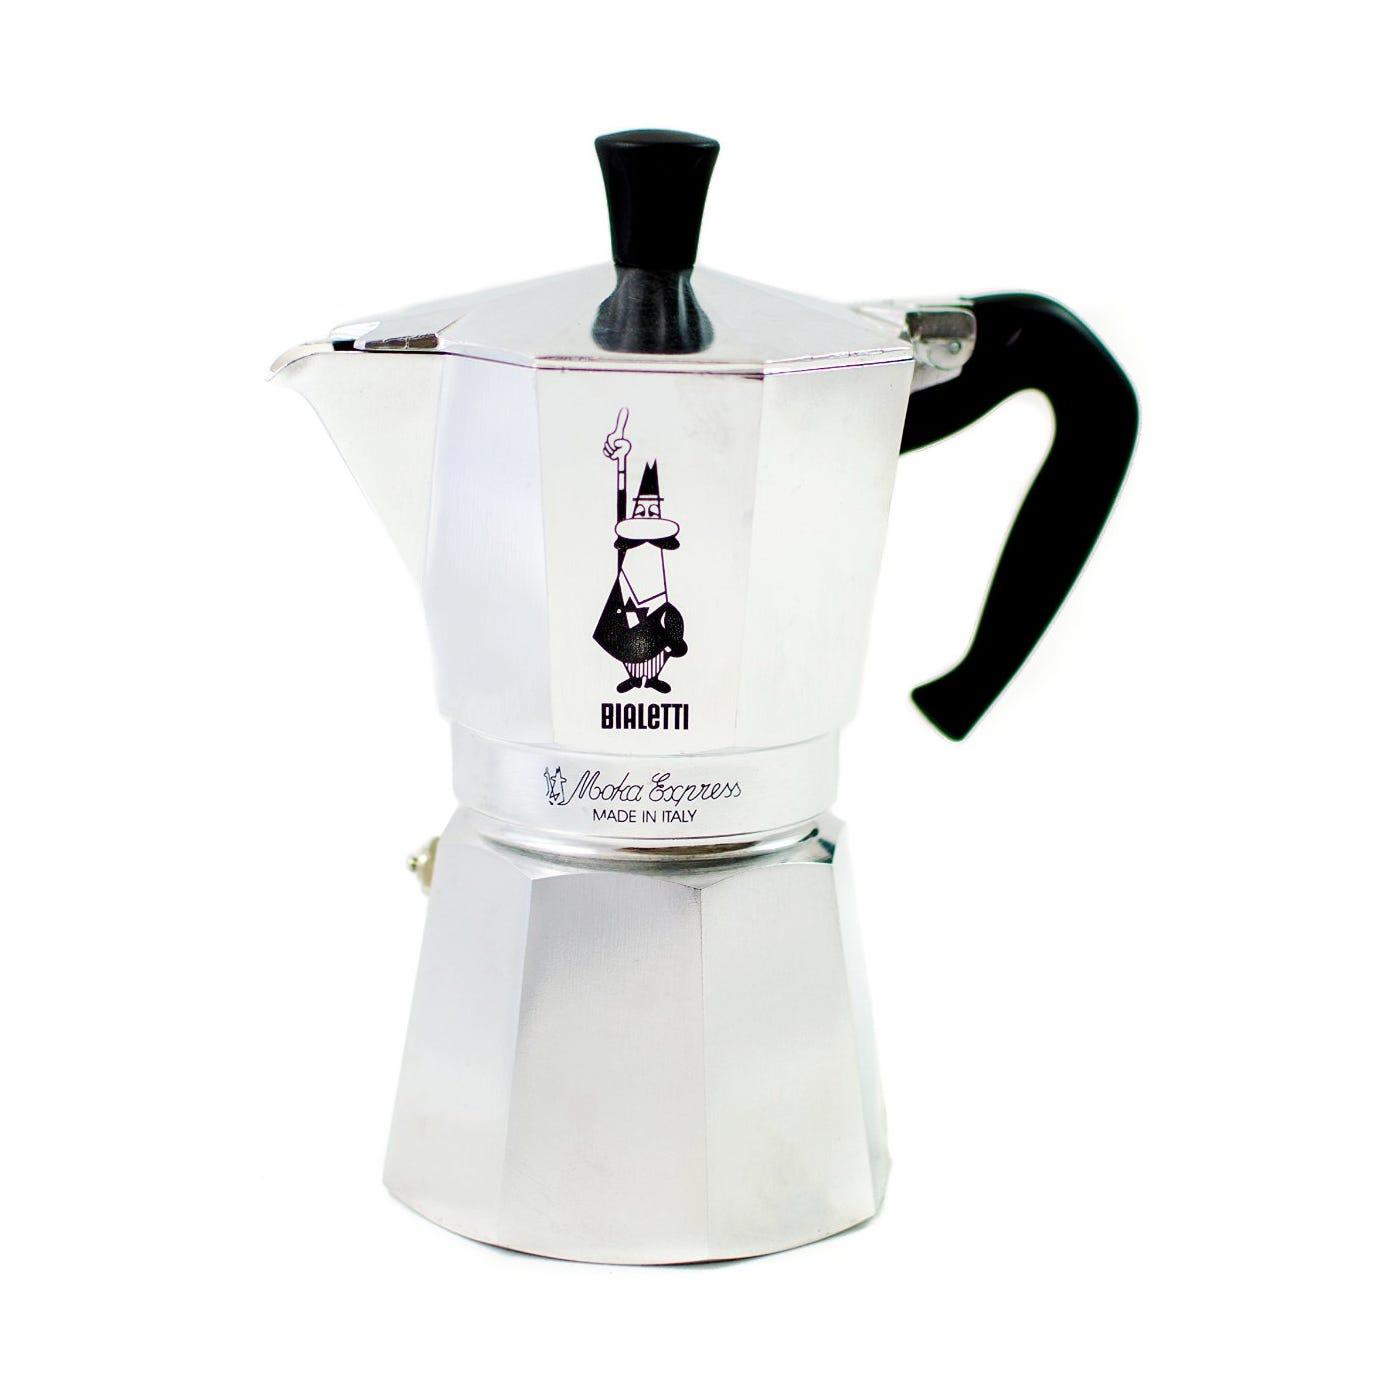 Bialetti Moka Express Espresso Maker